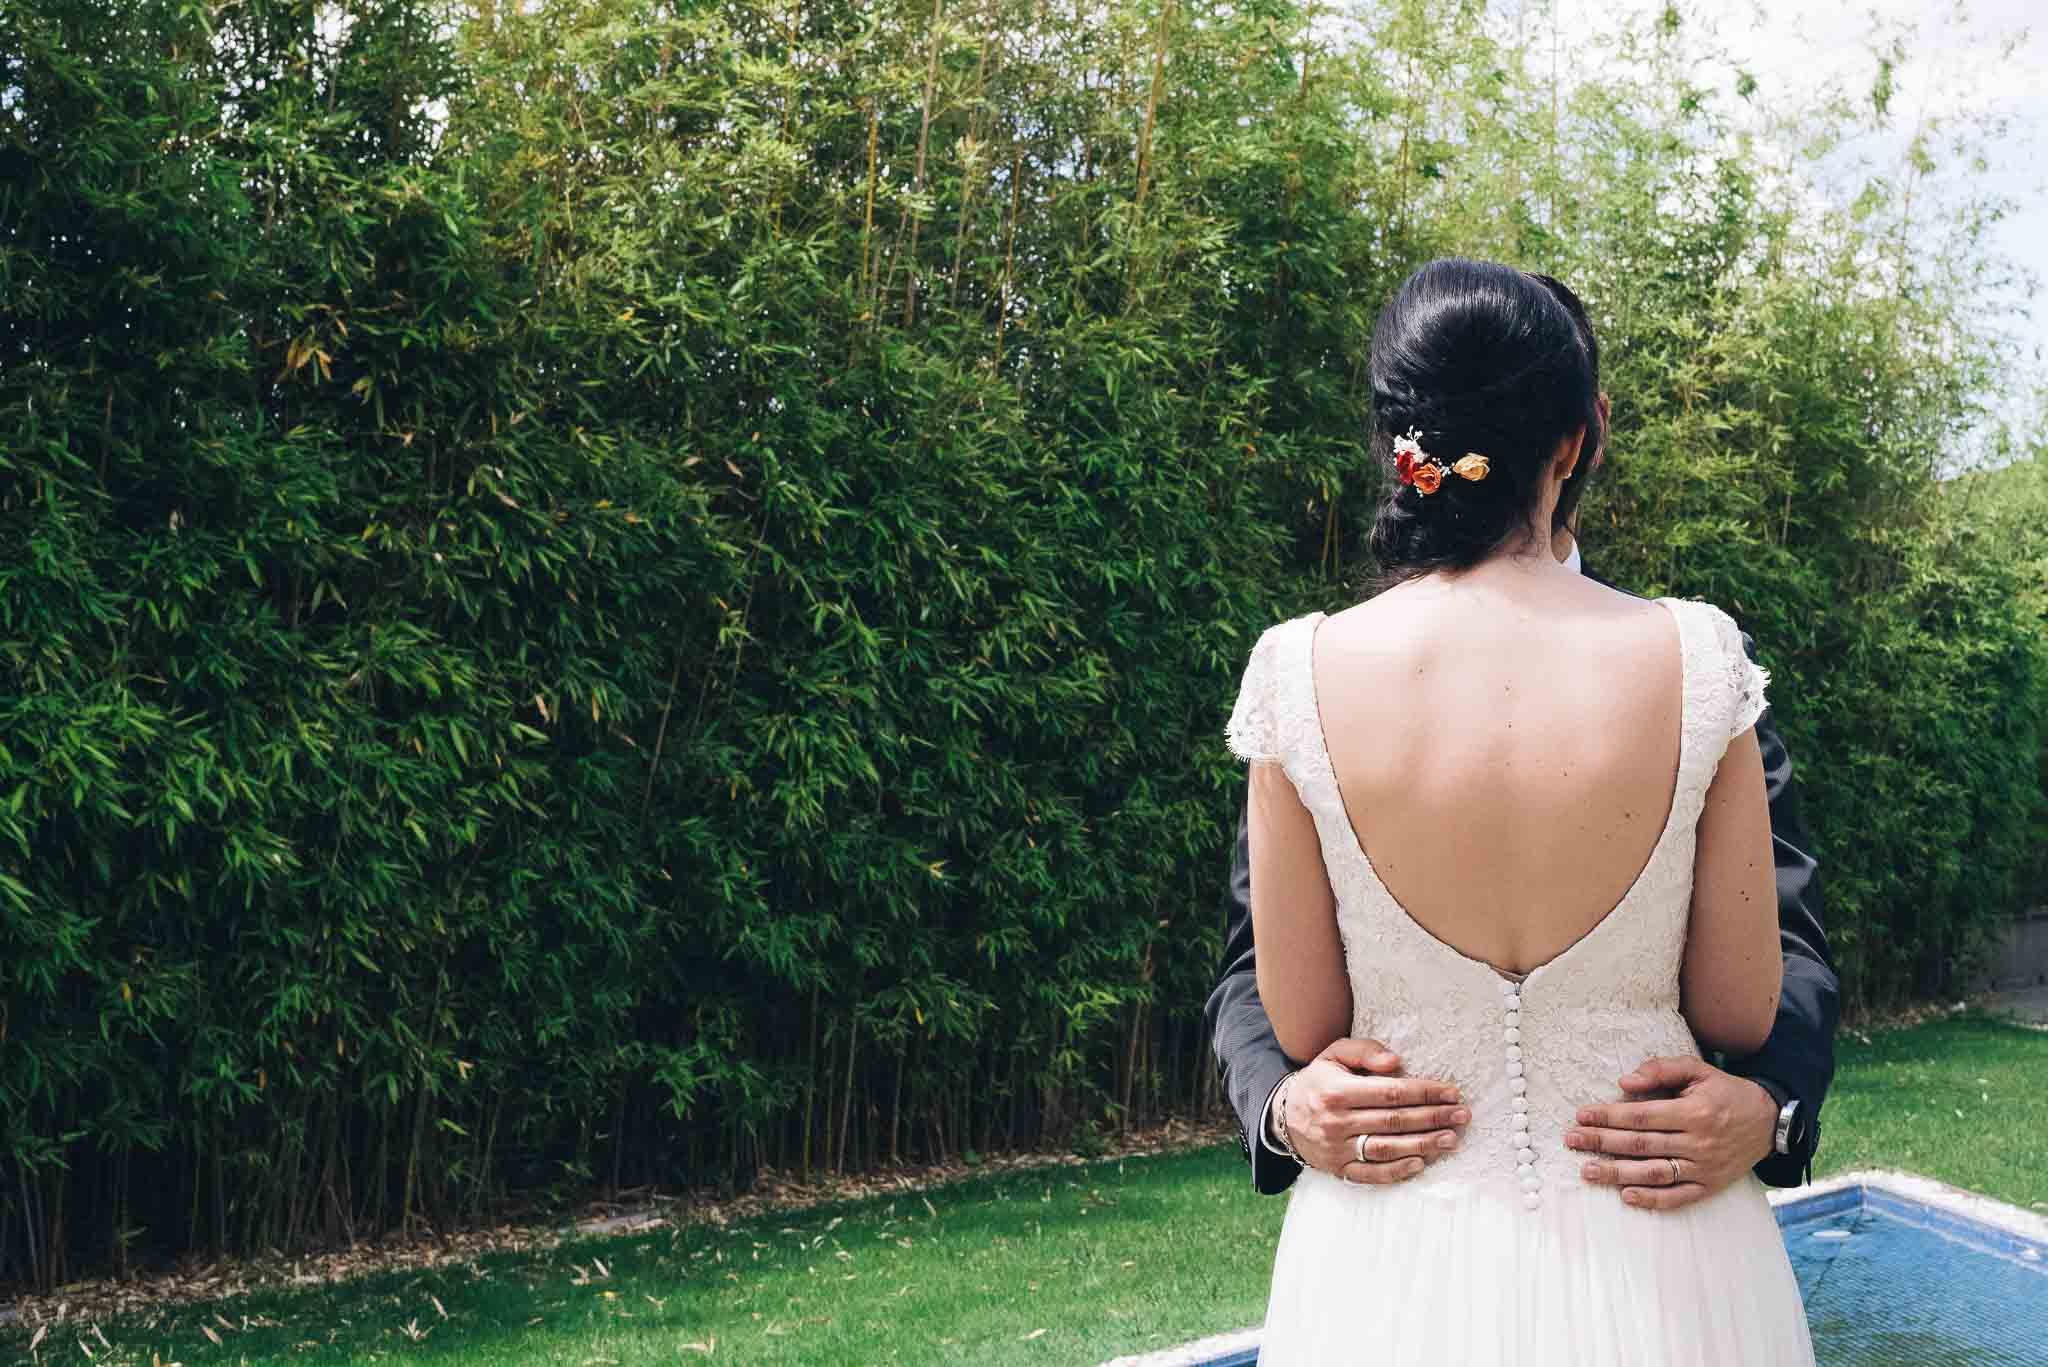 fotoperiodismo-laura-arroyo-fotografia-de-boda-hotel-qgat-san-cugat-barcelona-41